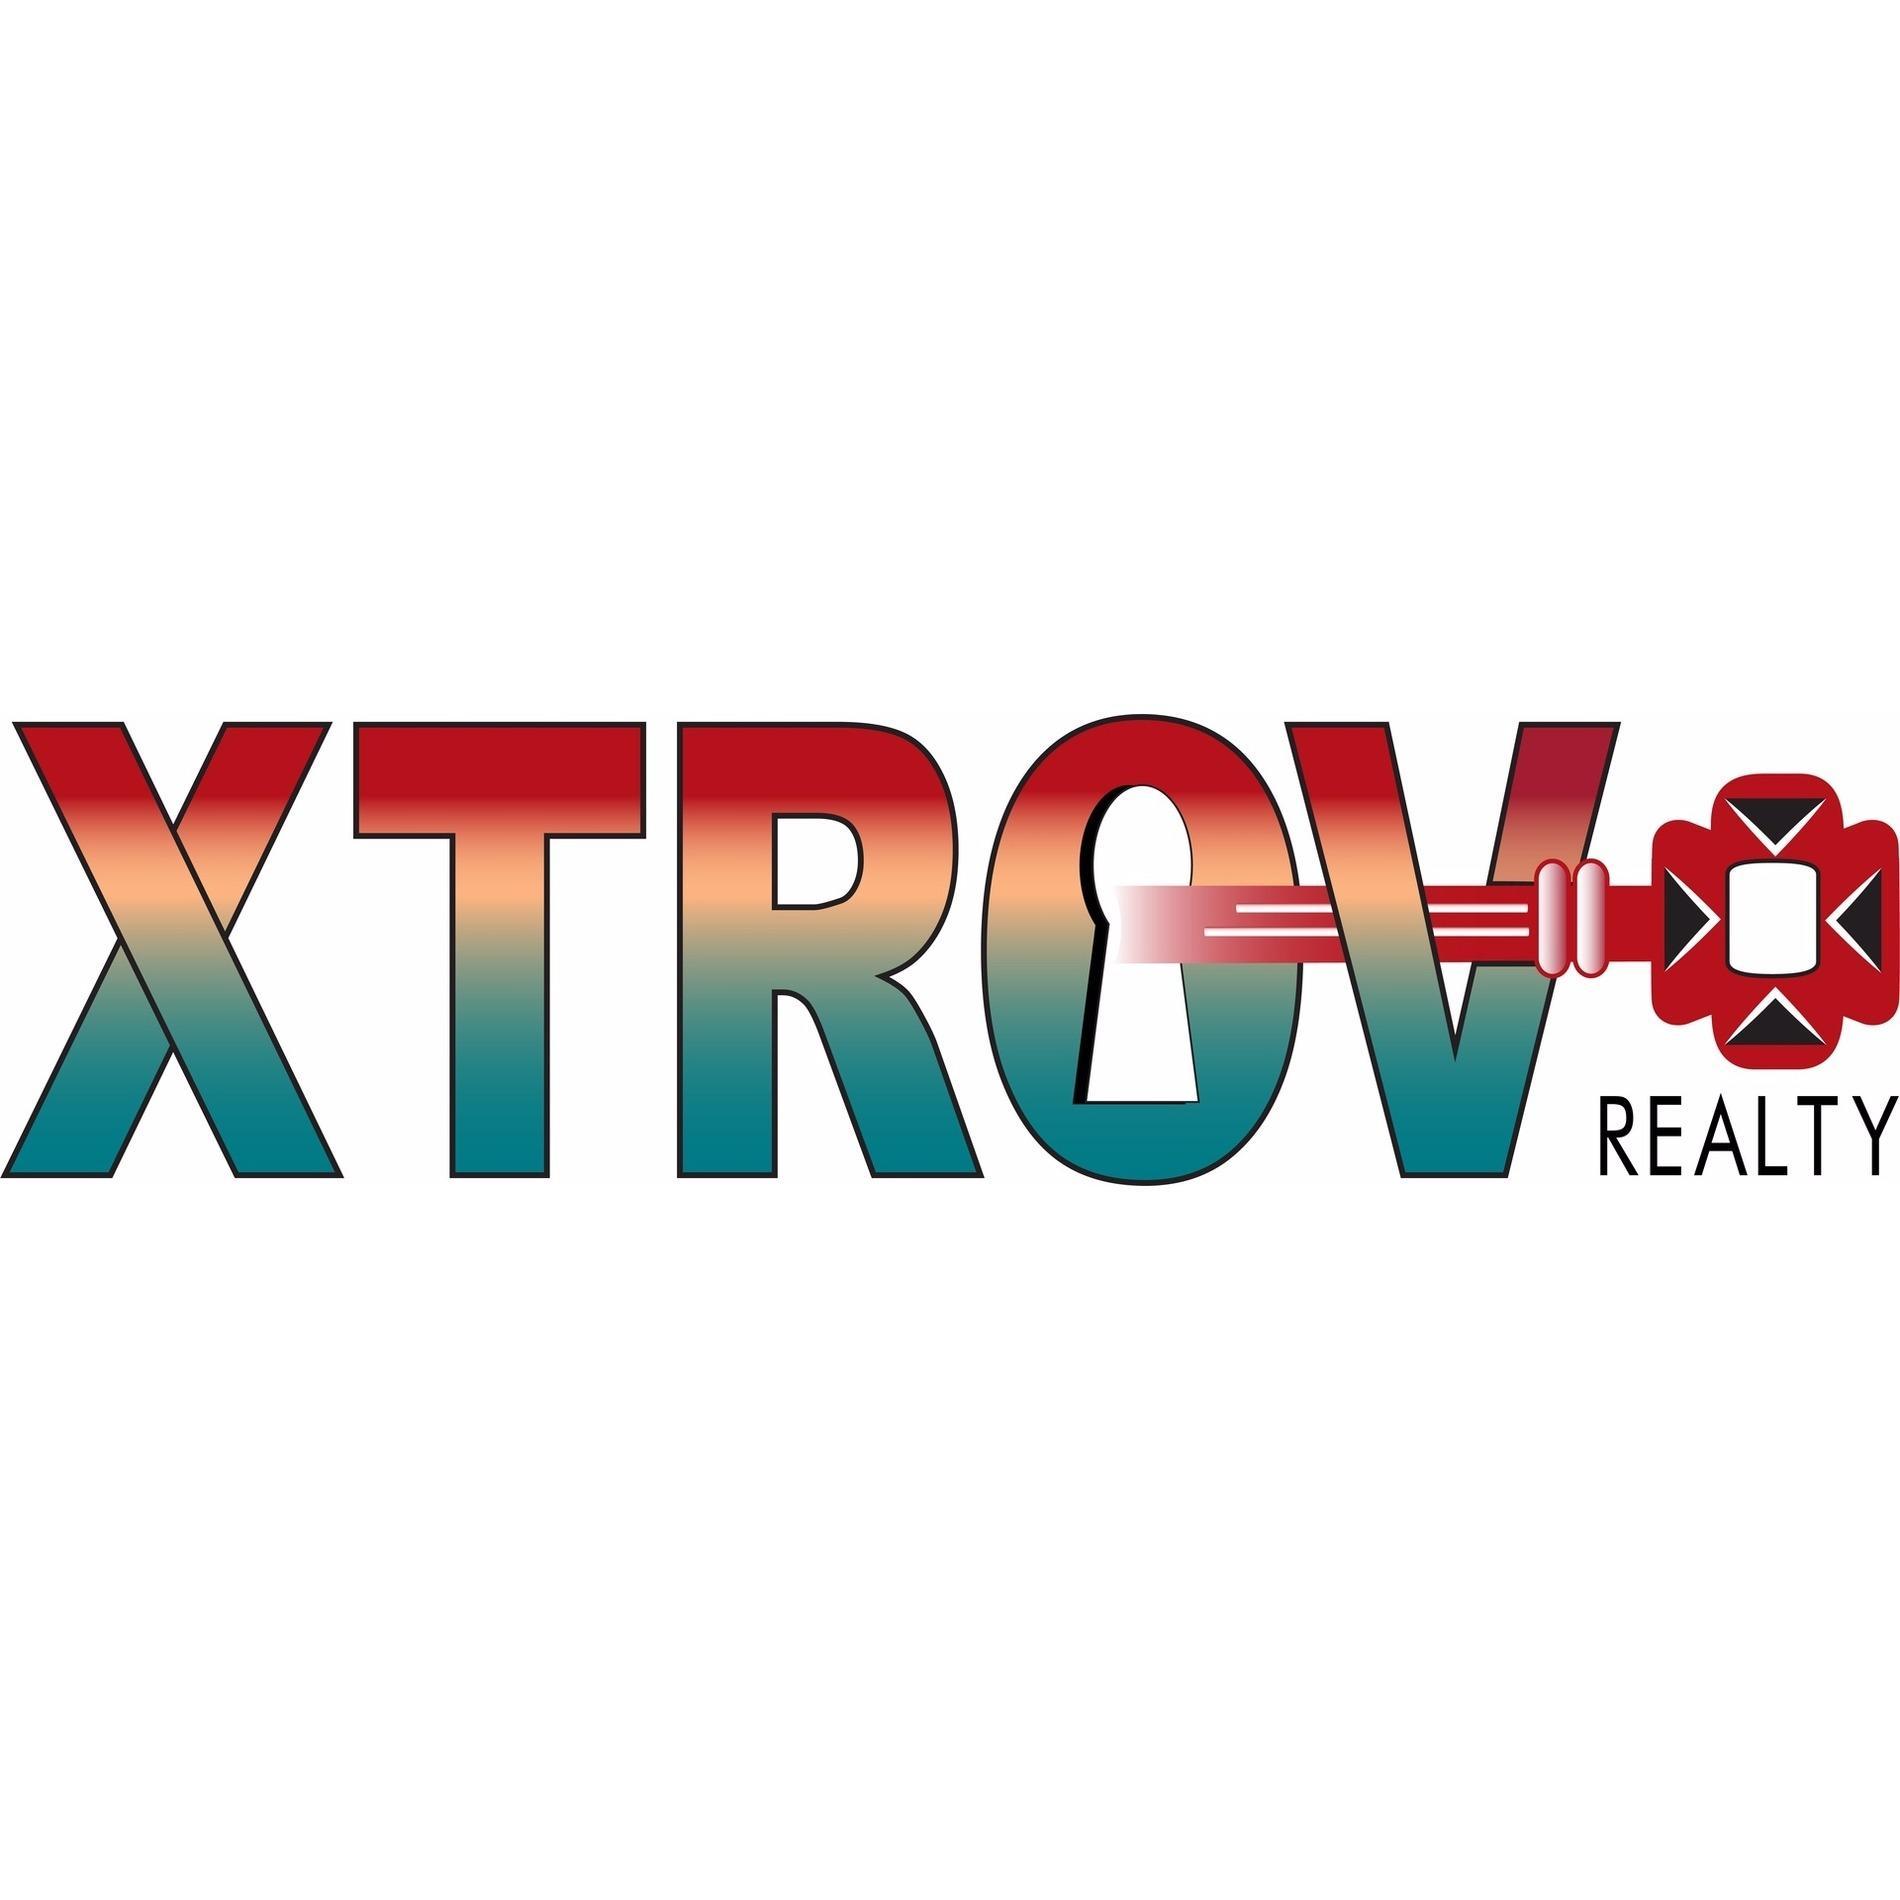 Xtrov Realty